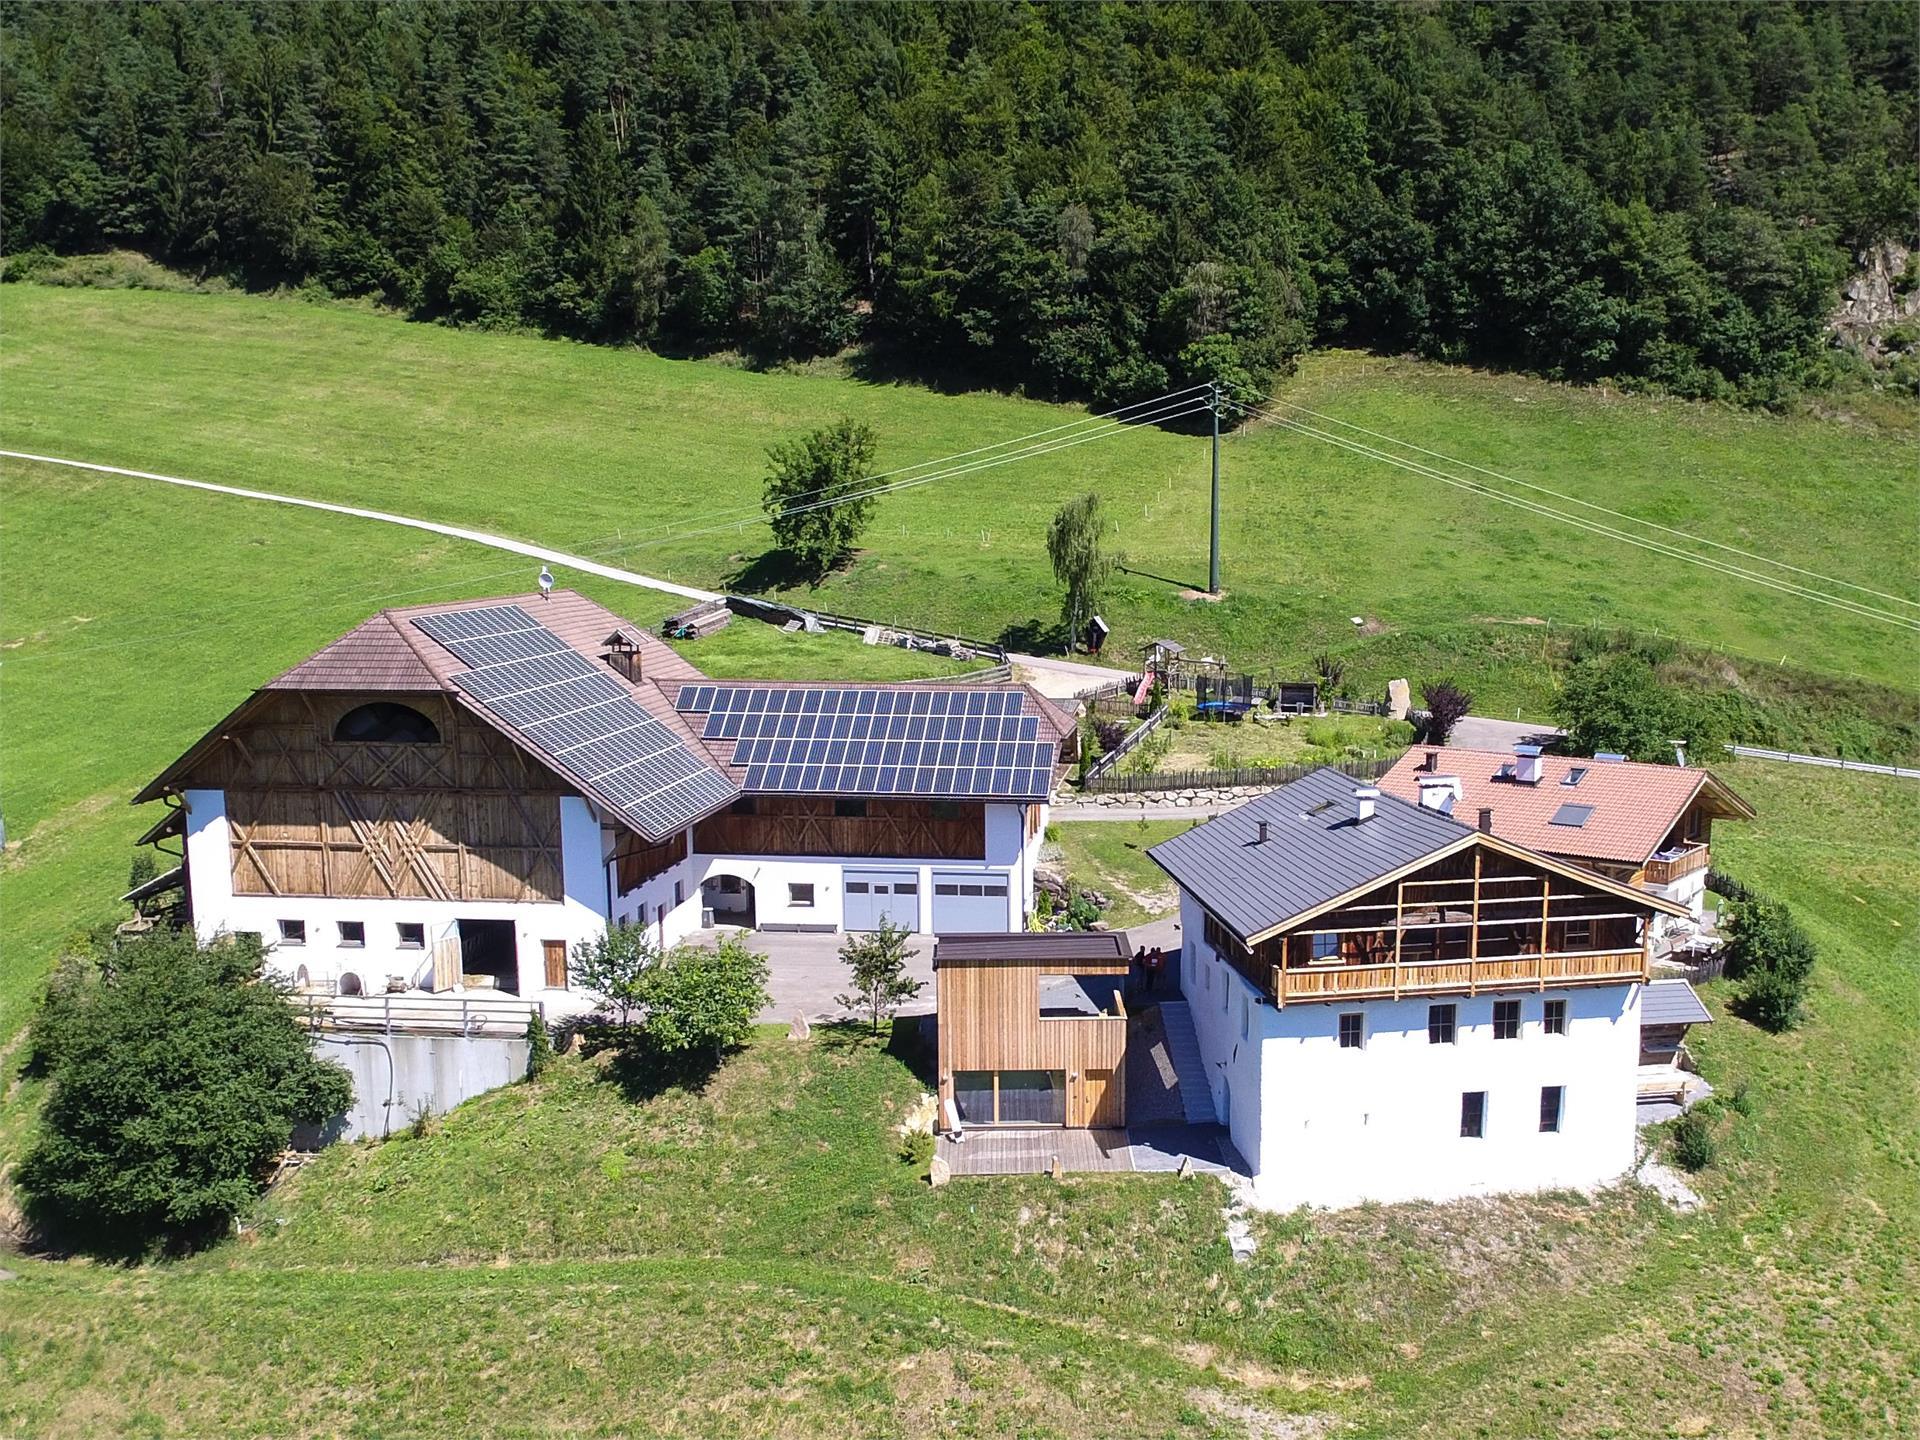 Rackerterhof, Bauernhof in Wangen am Ritten